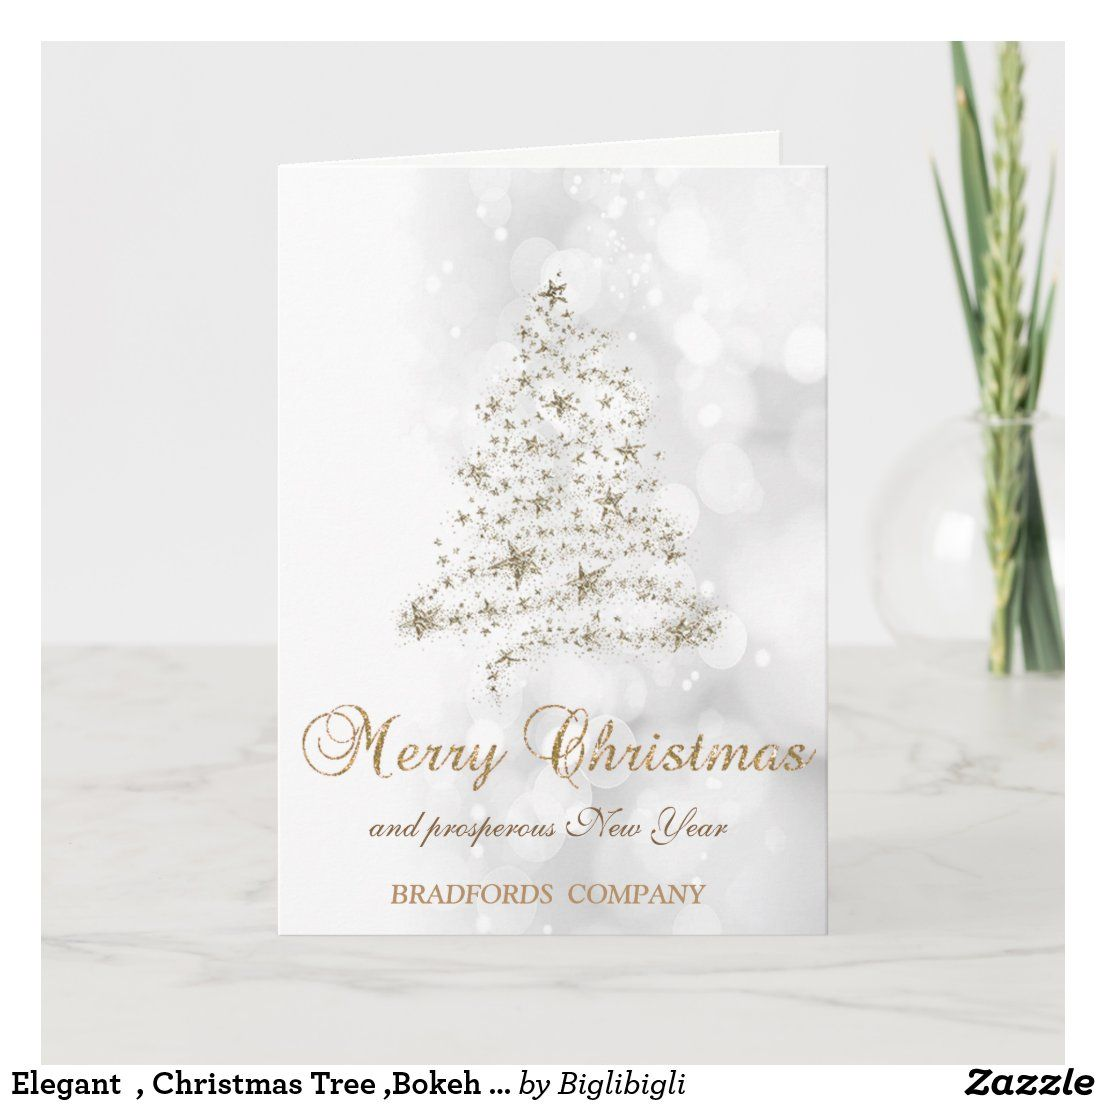 Elegant Christmas Tree Bokeh Company Holiday Card Zazzle Com Company Holiday Cards Holiday Design Card Business Holiday Cards